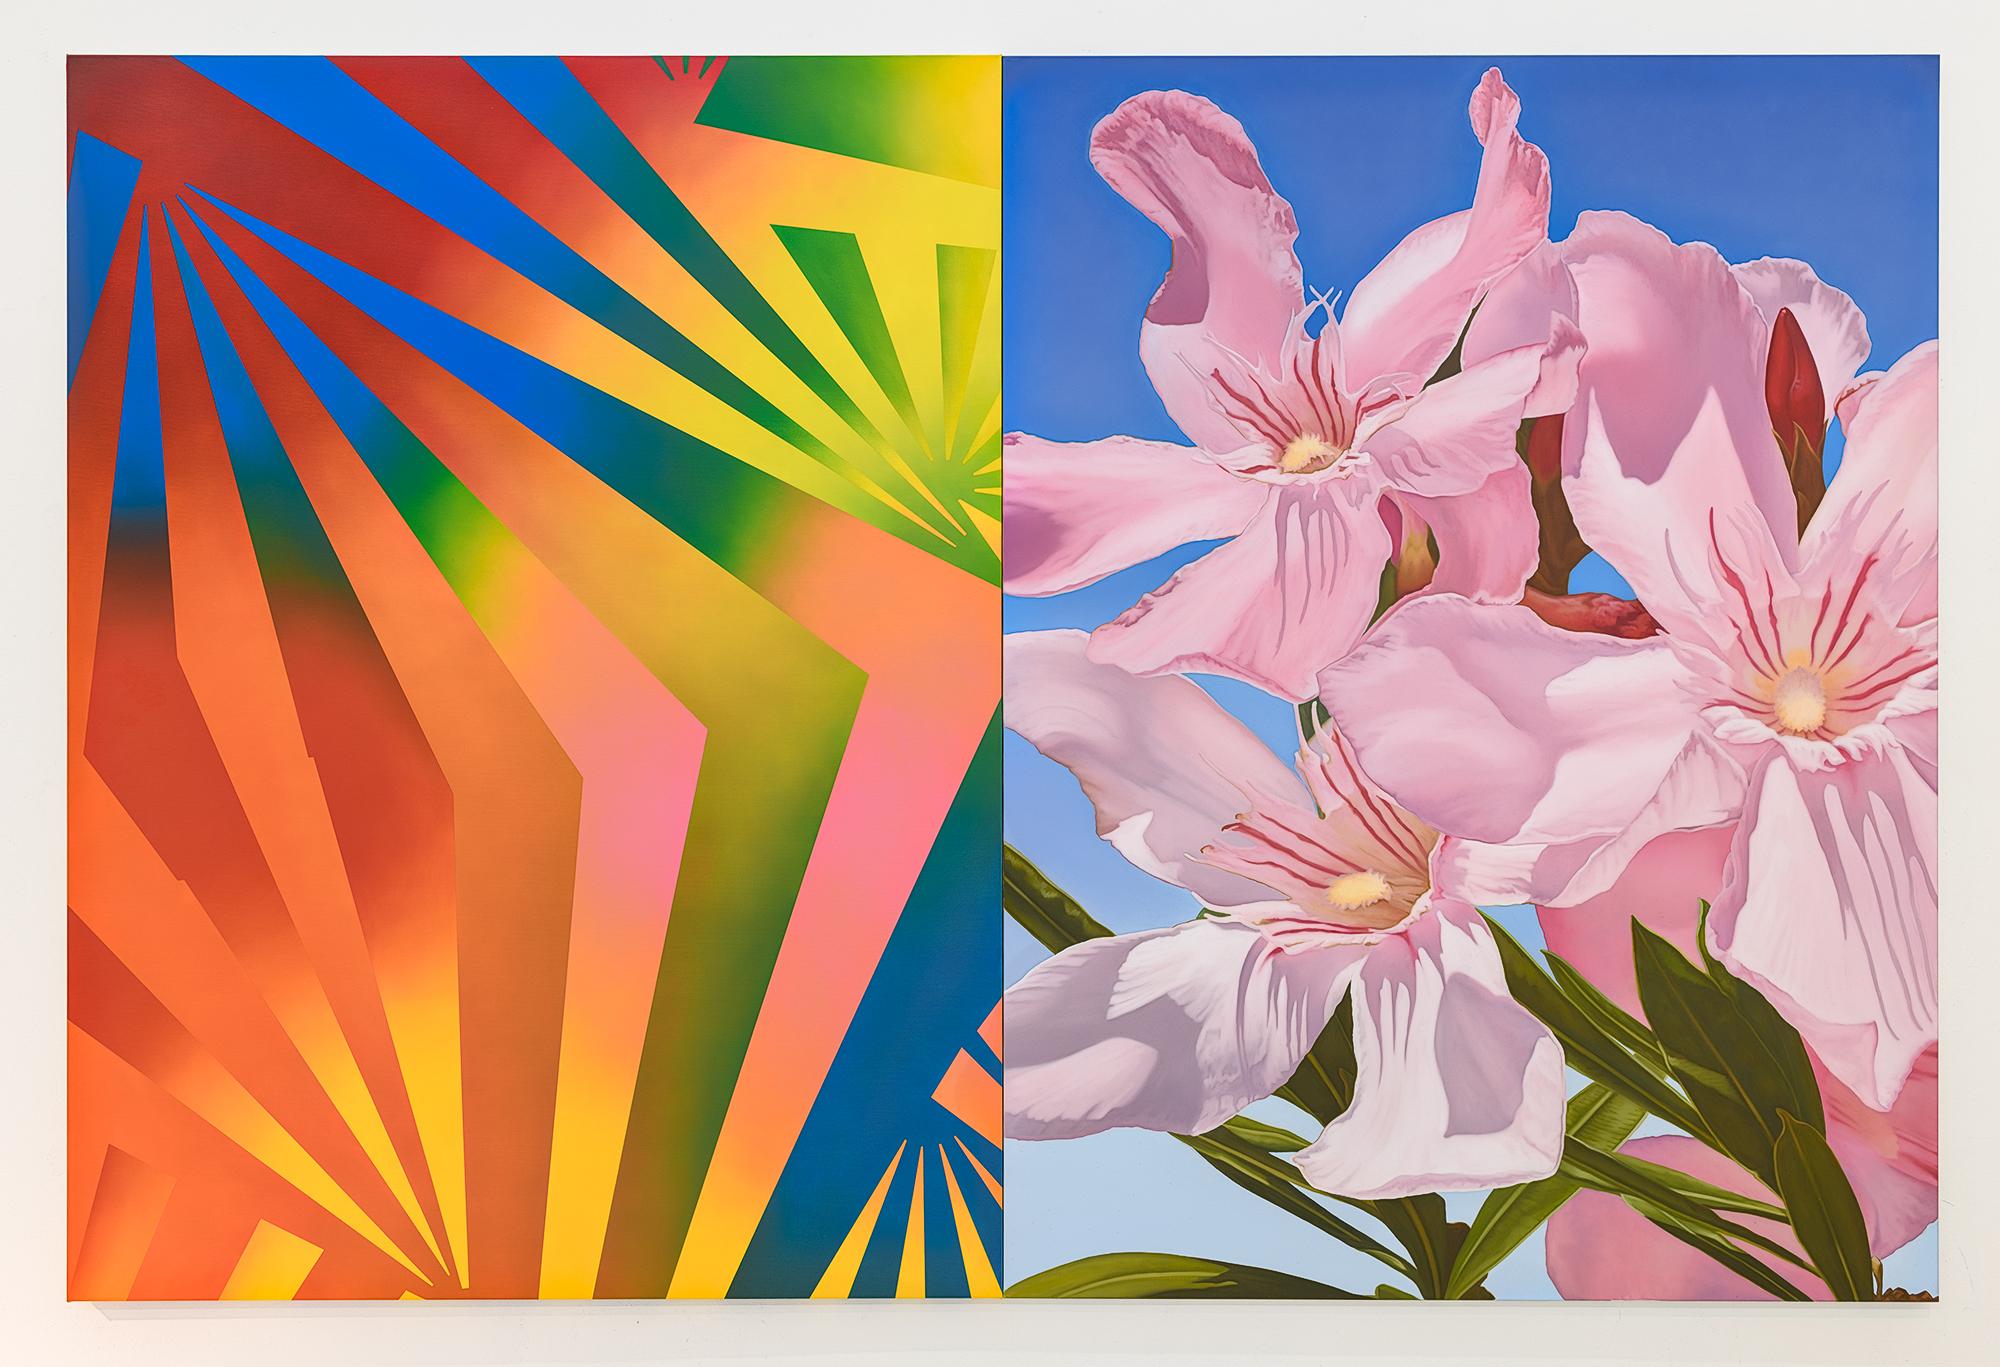 Mustafa Hulusi, (b. 1971),  Cyprus Realism (Oleander 1), Oil on Canvas, 2 parts, each part 204 x 153 cm.